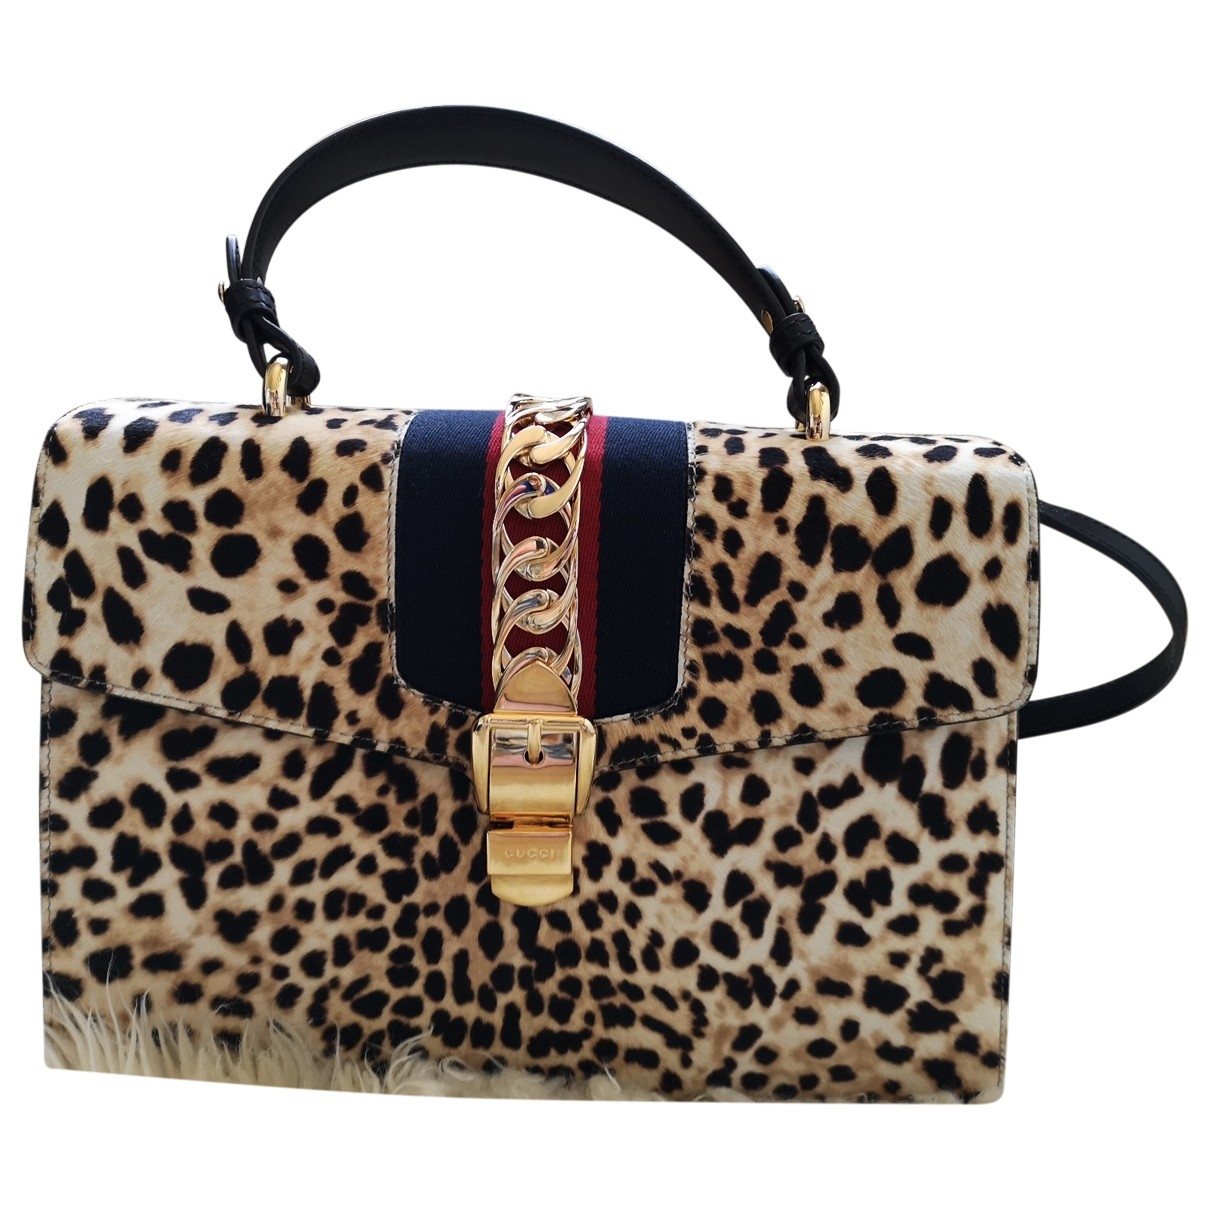 Gucci Sylvie Multicolour Pony-style calfskin handbag for Women \N